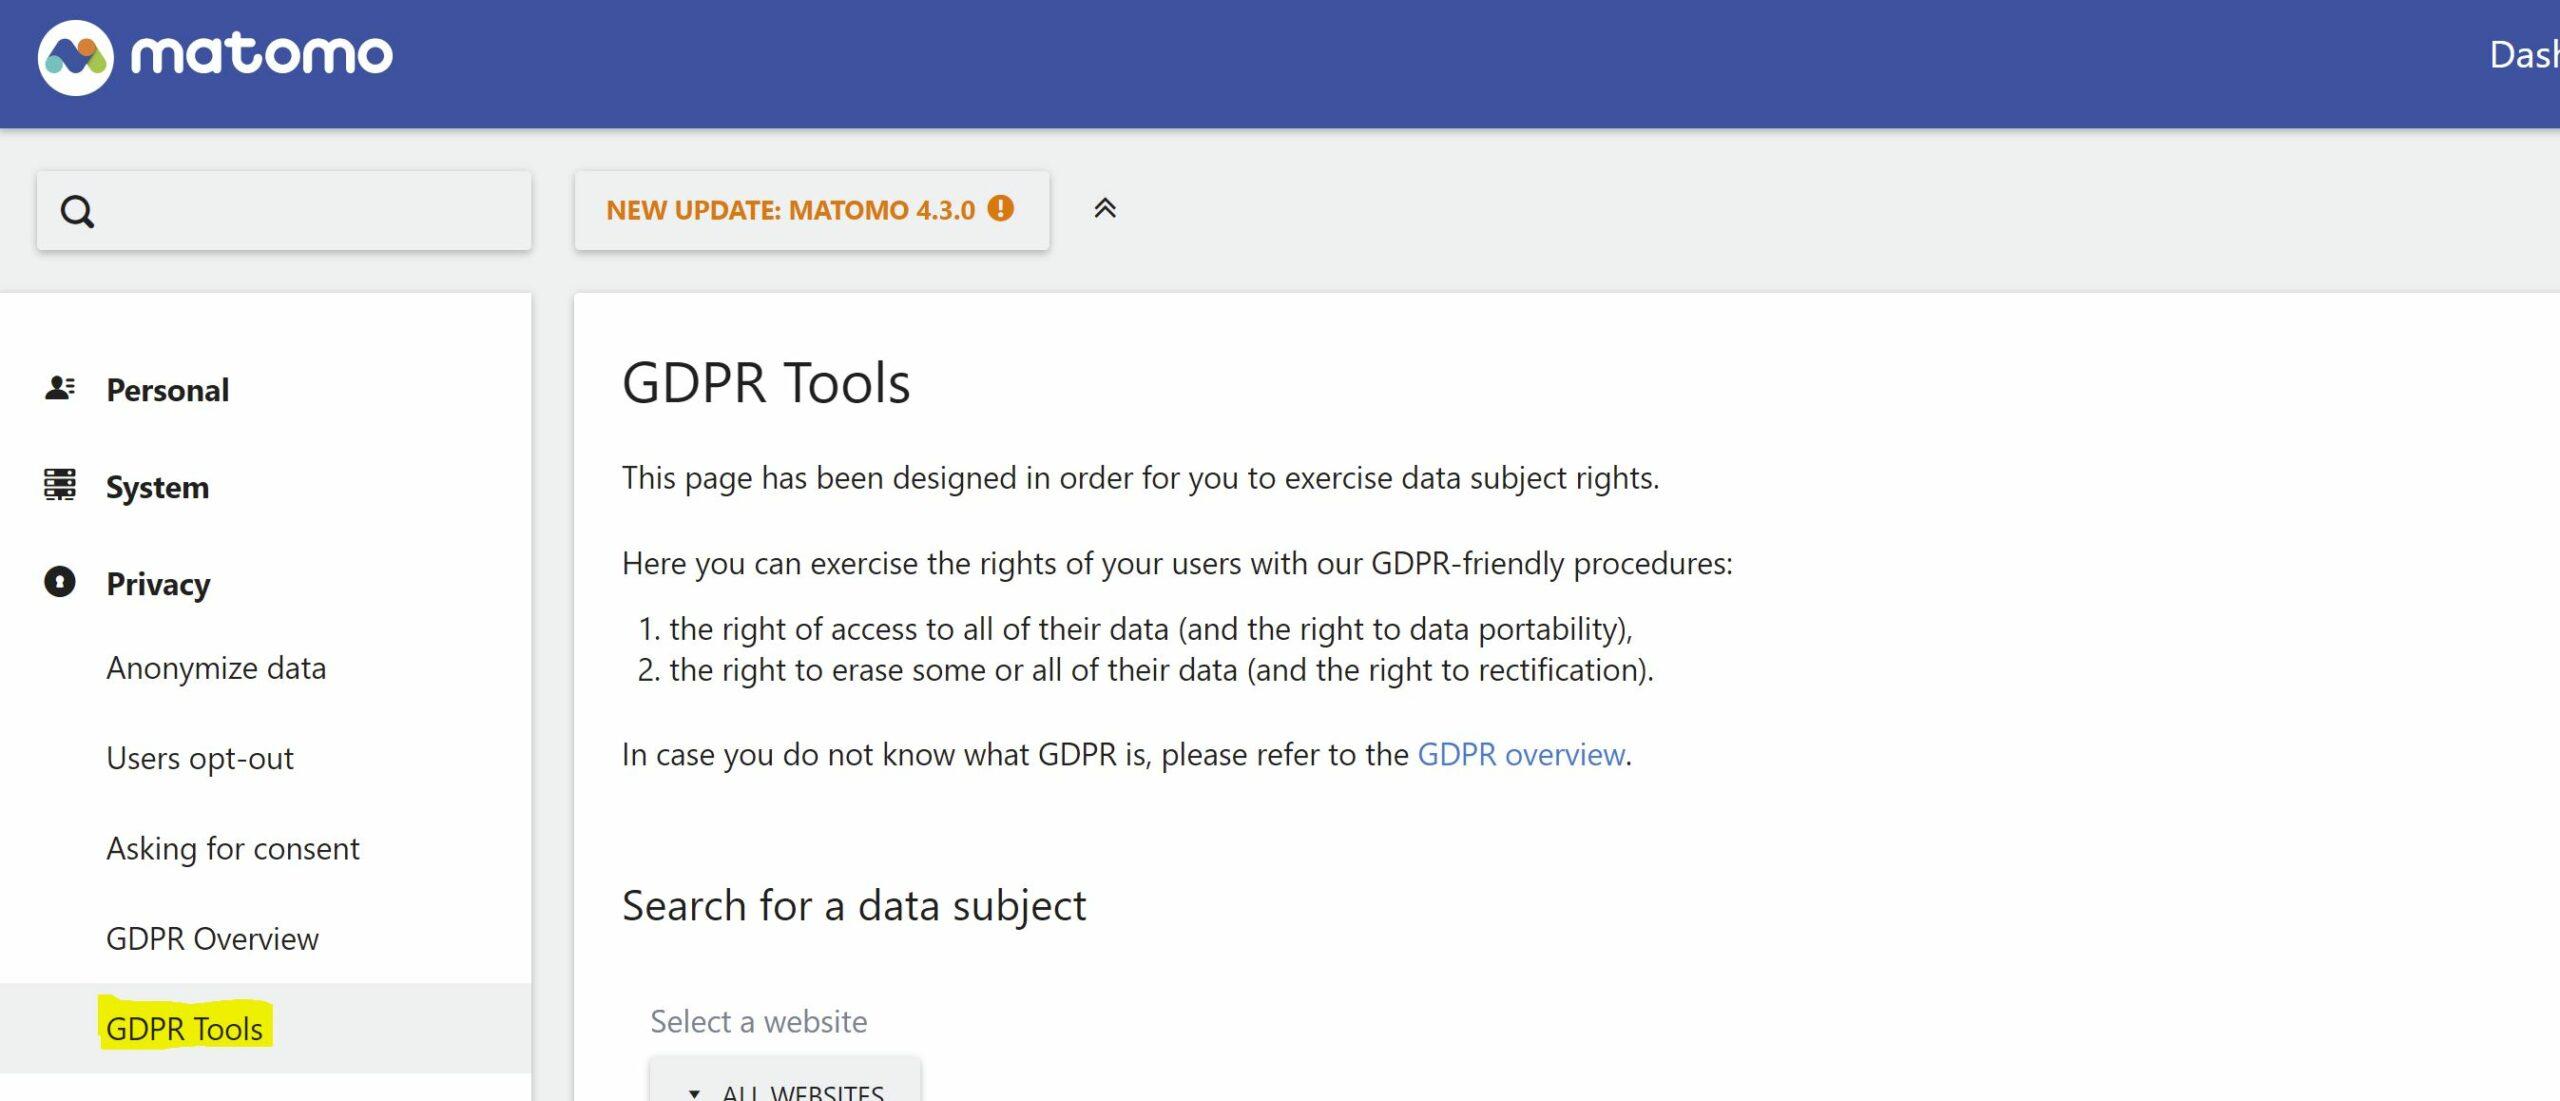 matomo - gdpr tools - pii deletion